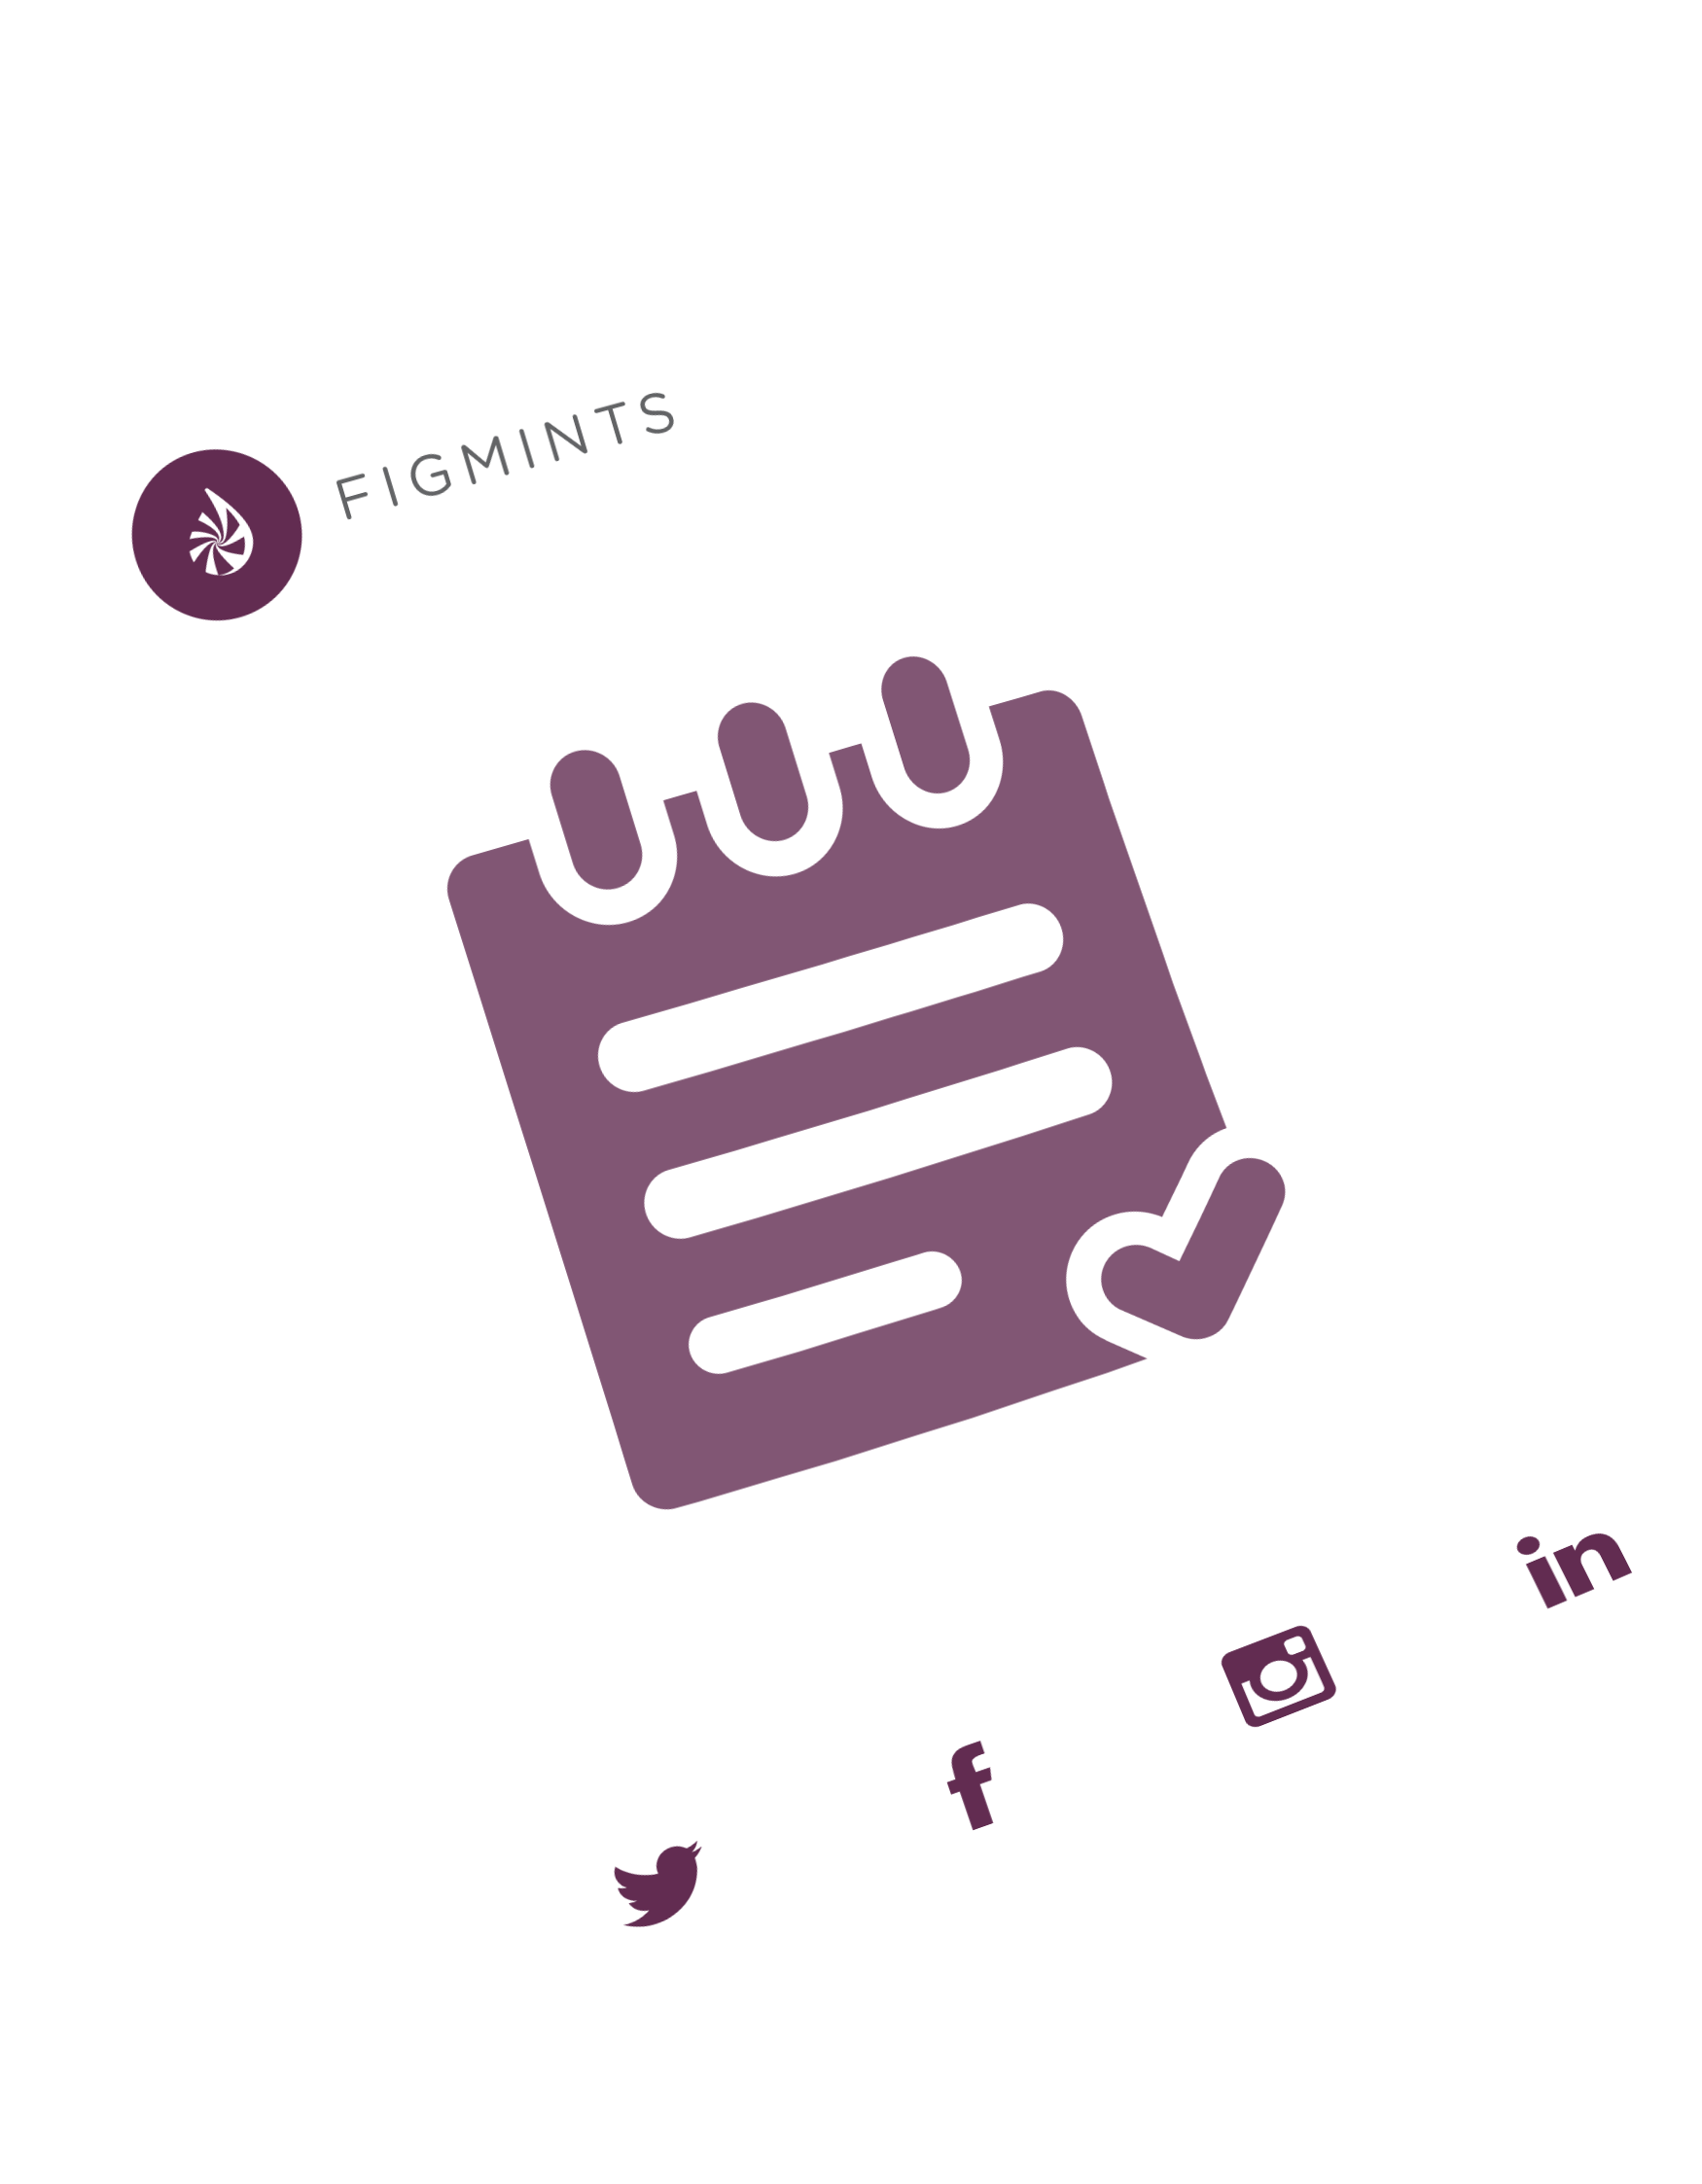 Figmints Rebranding Checklist